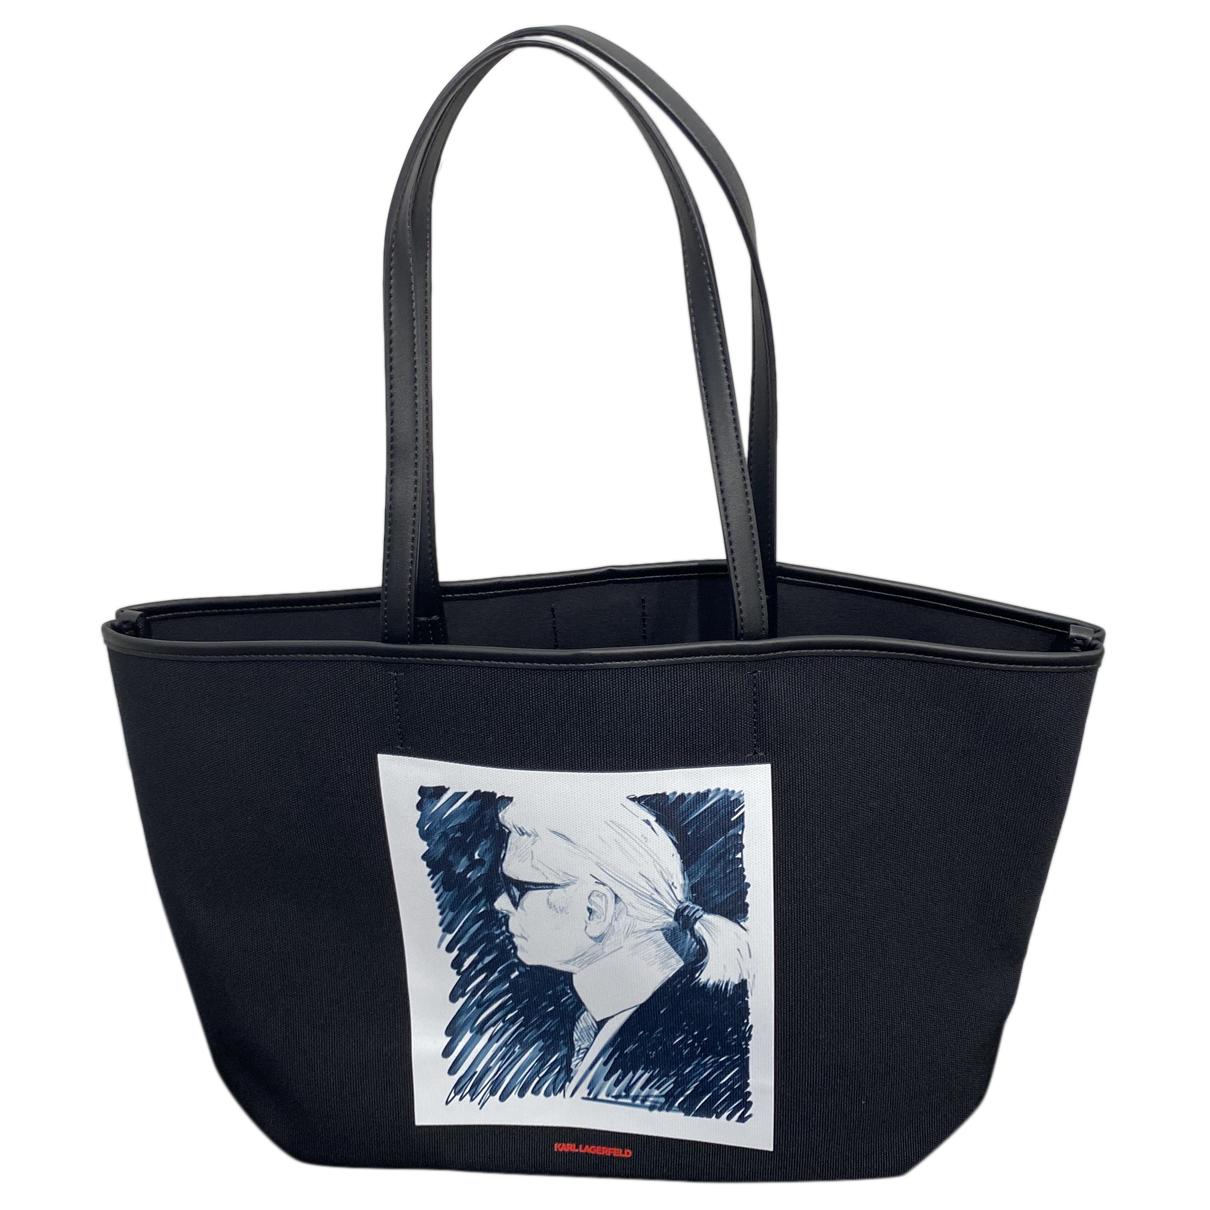 Karl Lagerfeld - Sac a main   pour femme en toile - noir